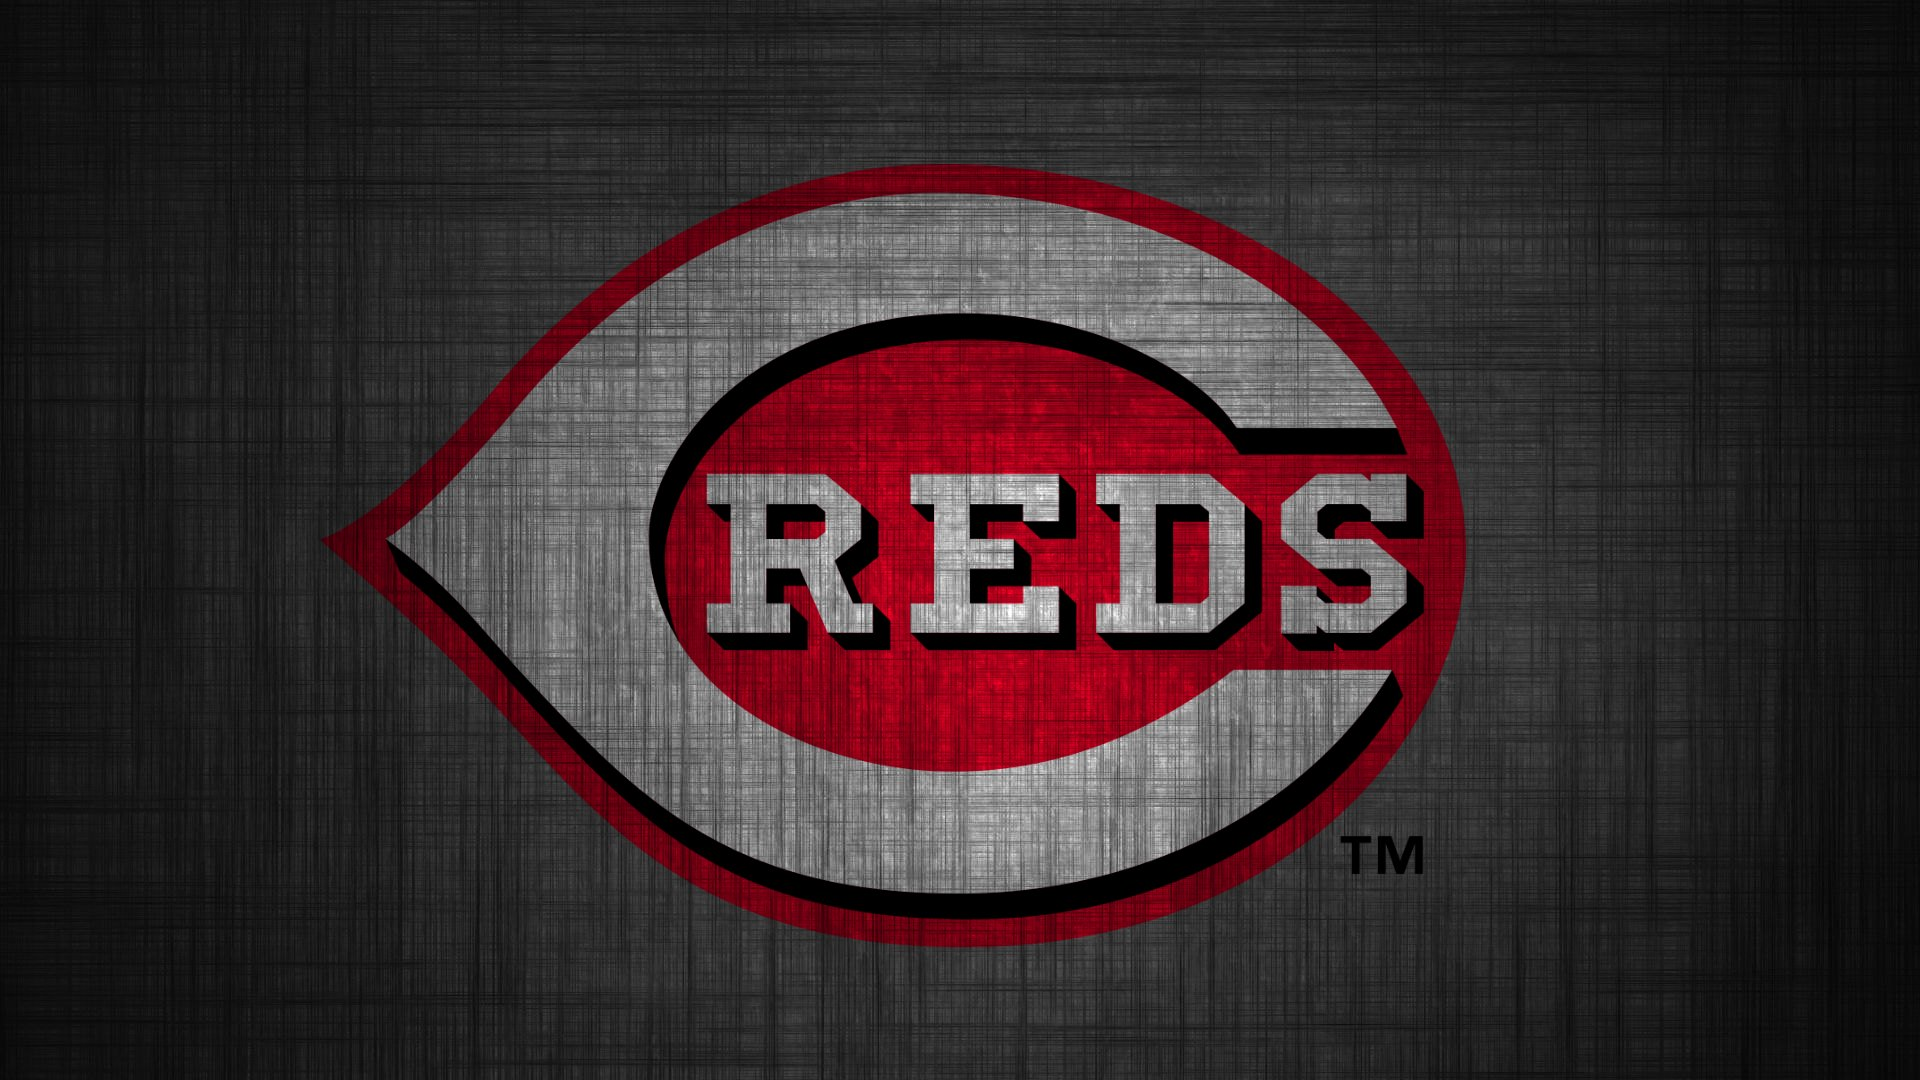 Cincinnati Reds wallpaper 1920x1080 69250 1920x1080